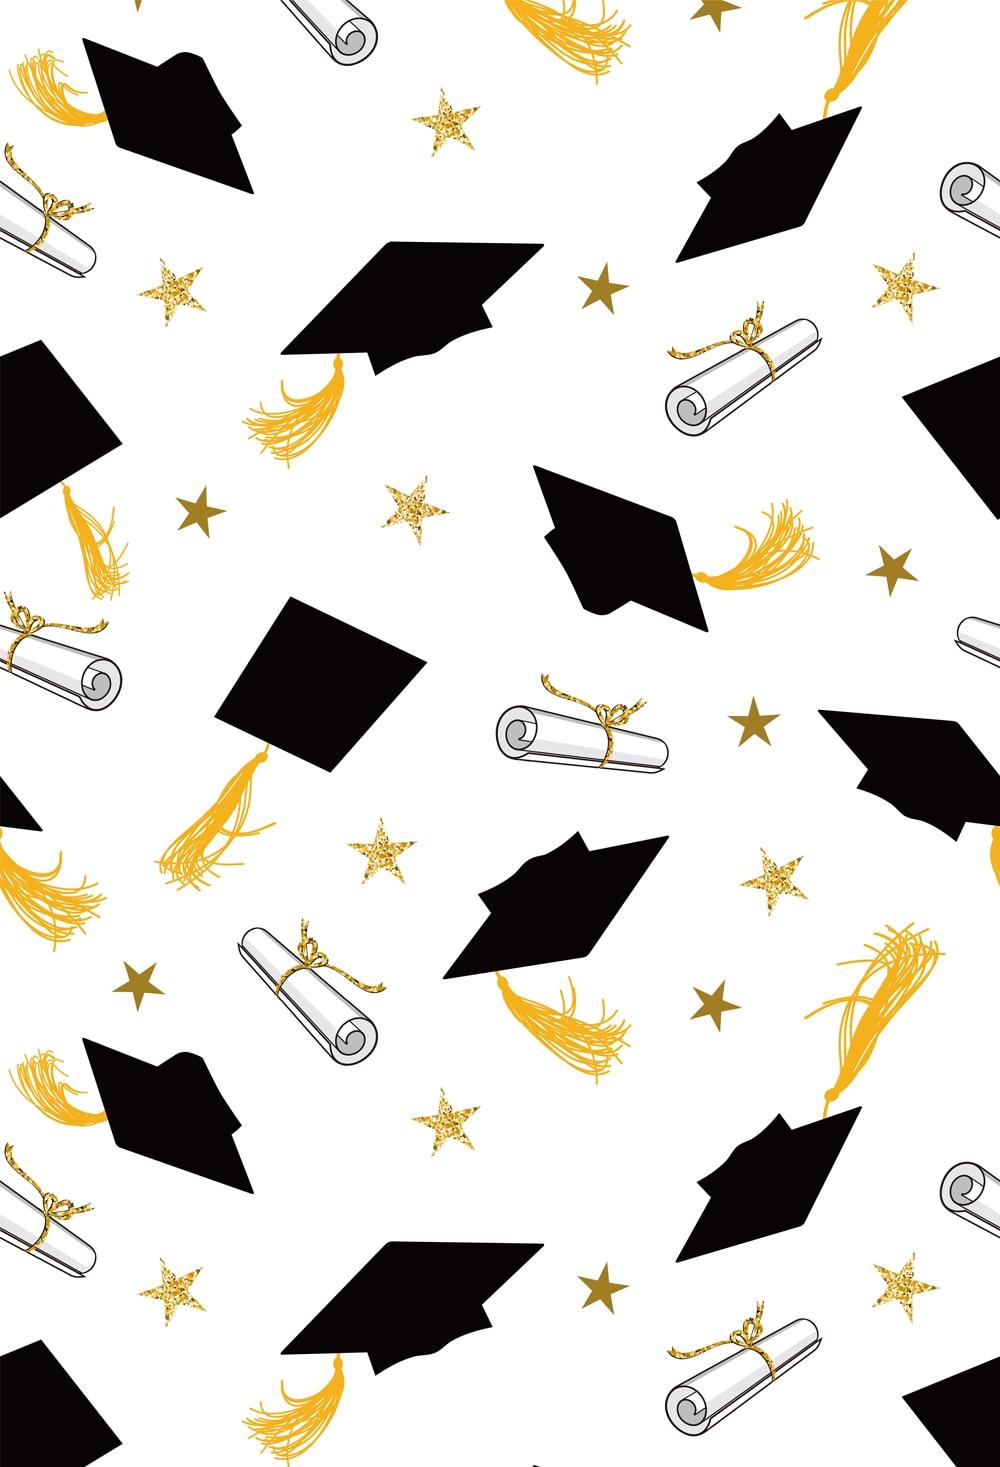 graduation party photography backdrop thin vinyl caps